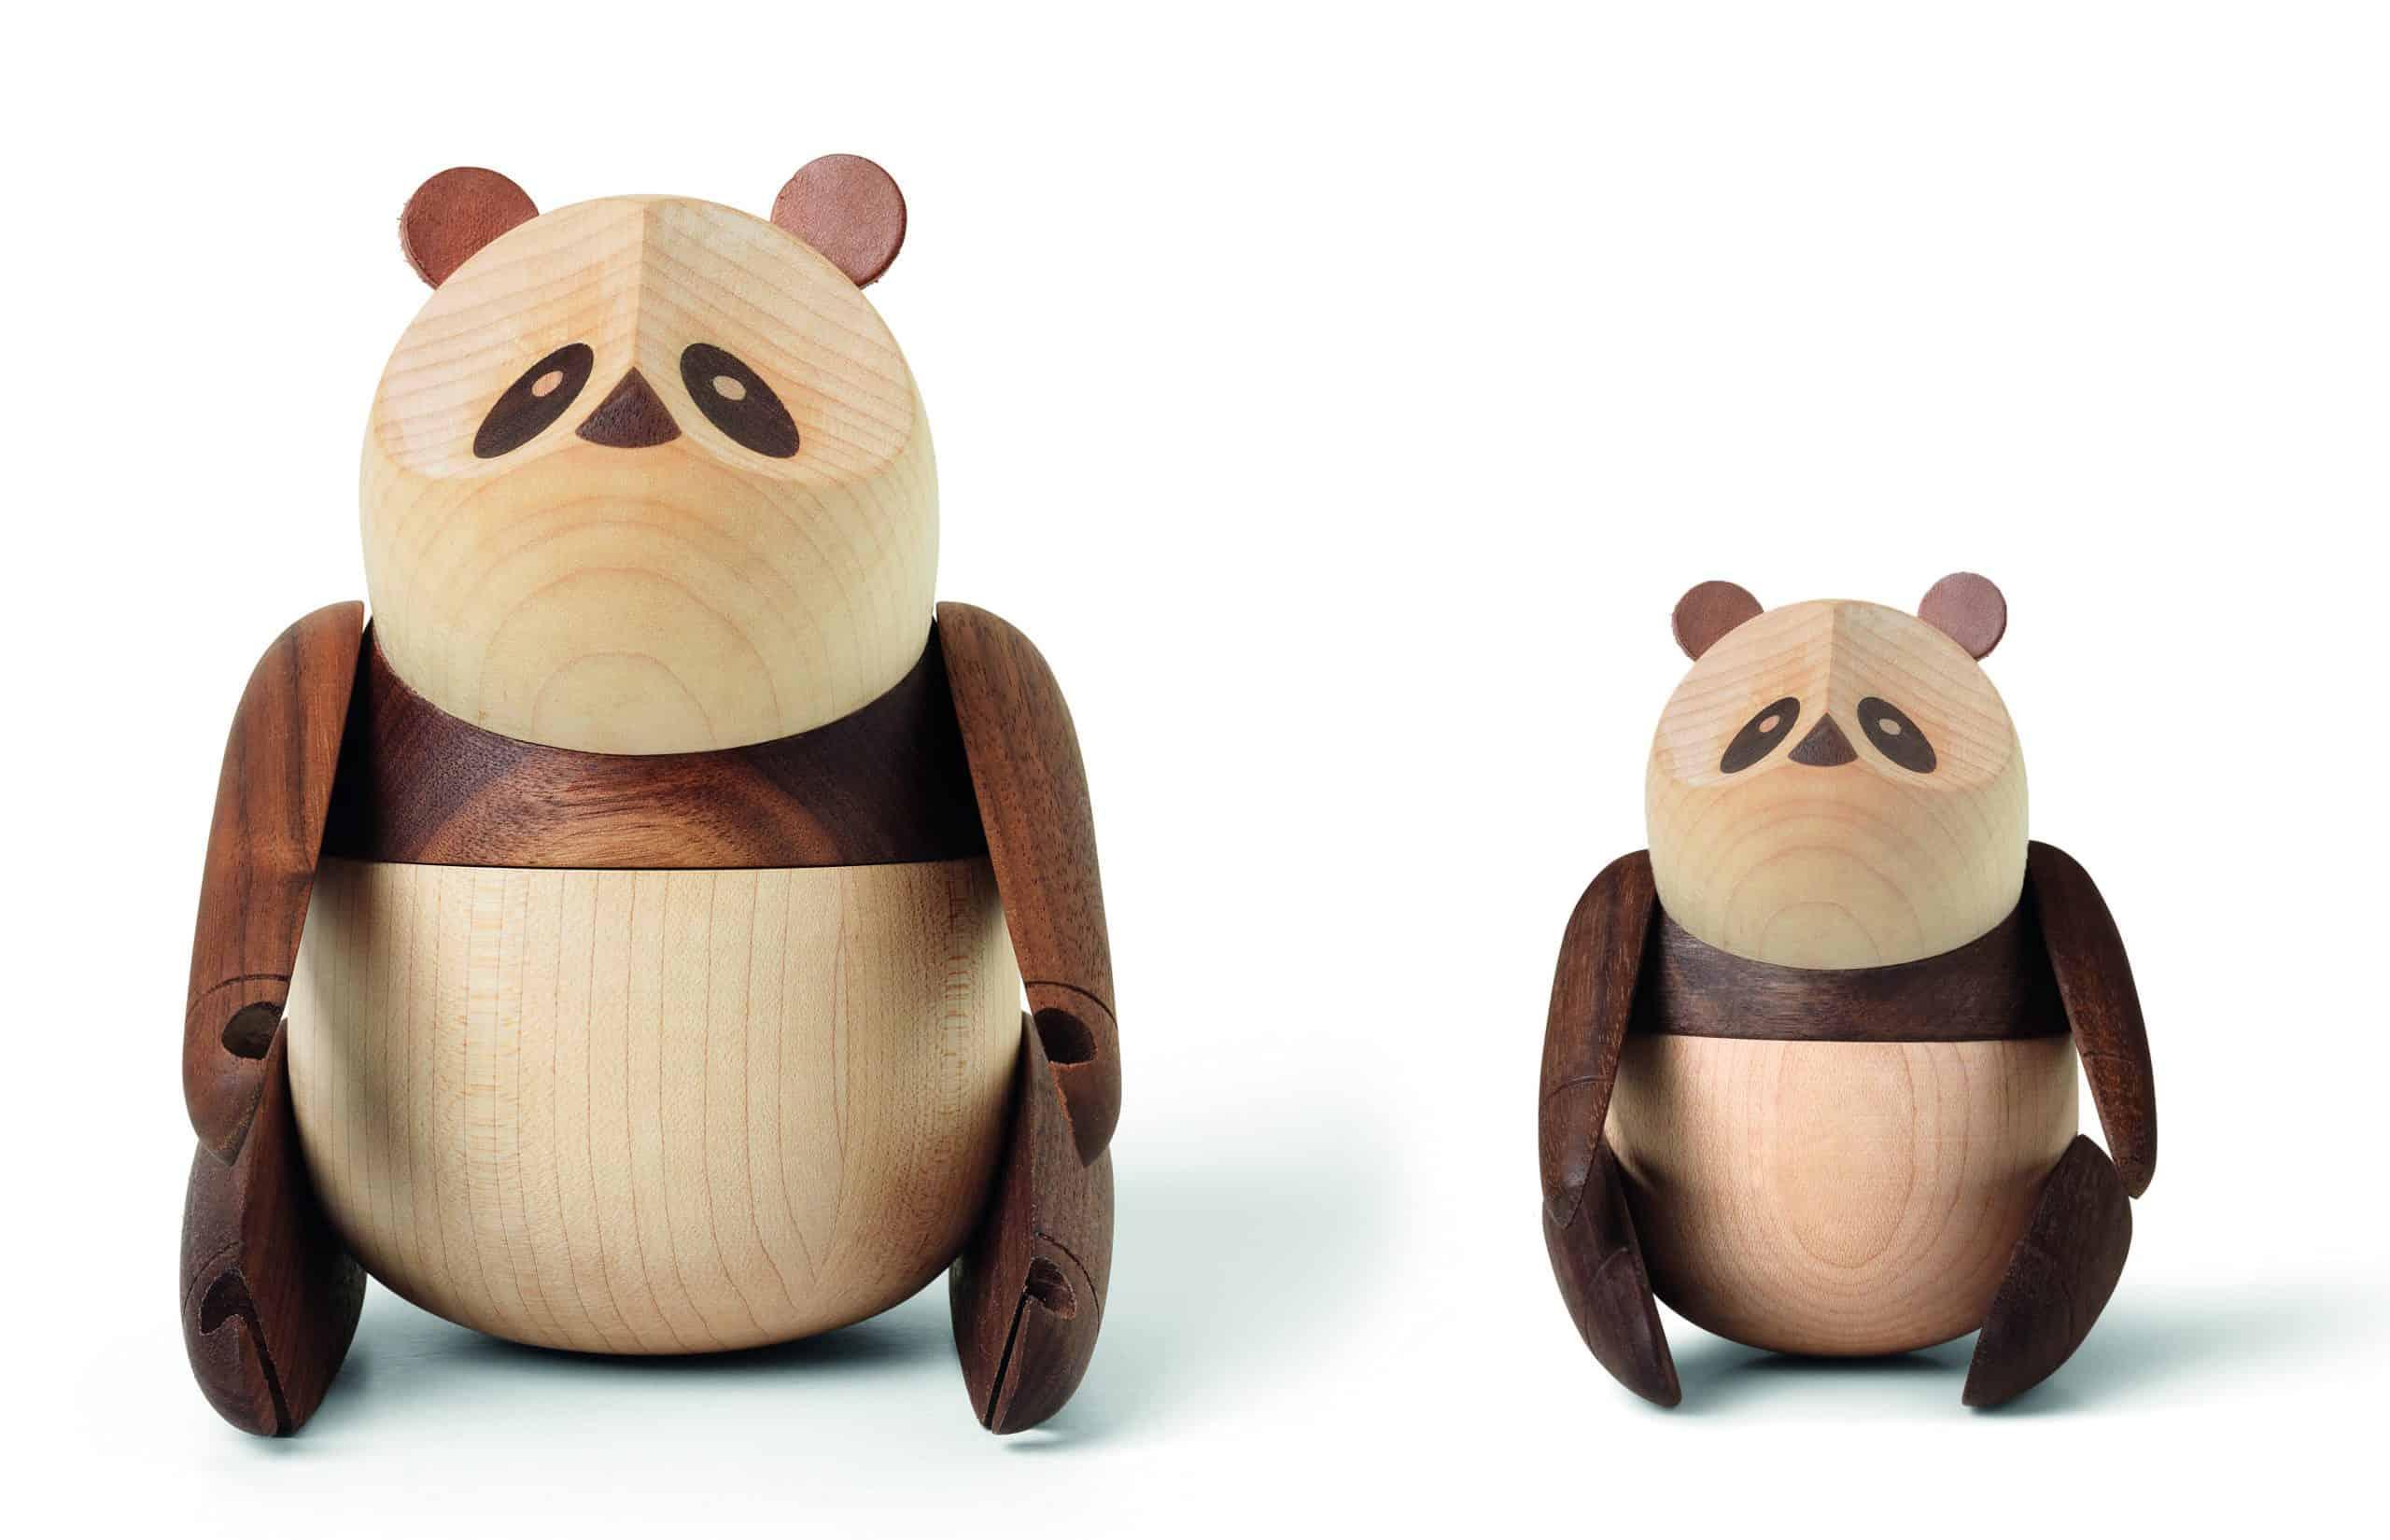 ARCHITECTMADE Panda Walnut Maple Bjarke Ingels